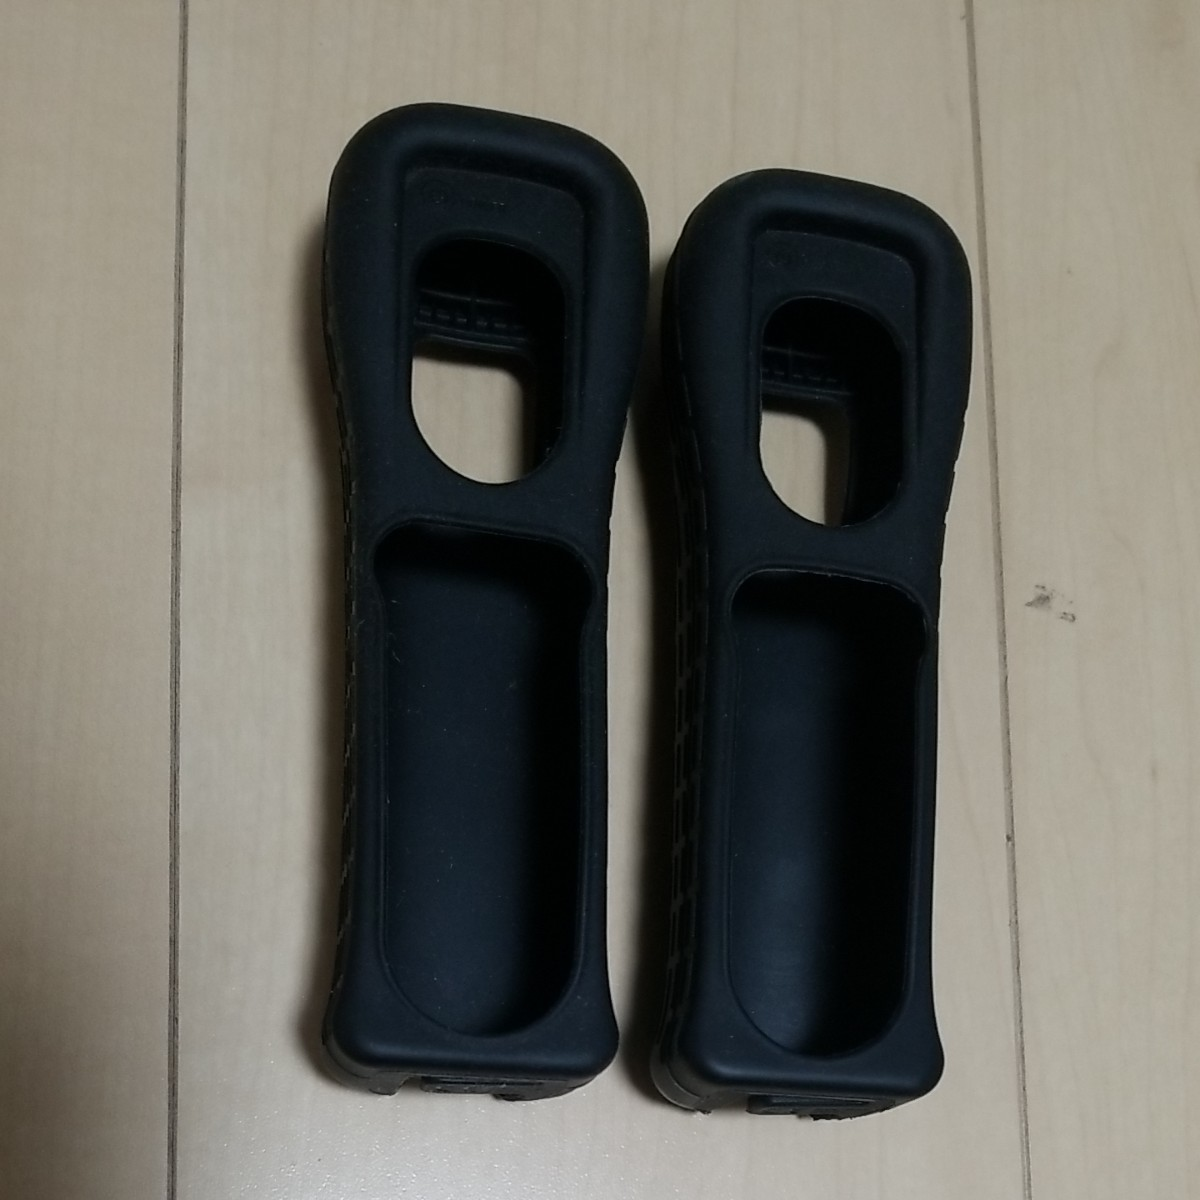 Wiiリモコンジャケット シリコンカバー 2個 黒 任天堂